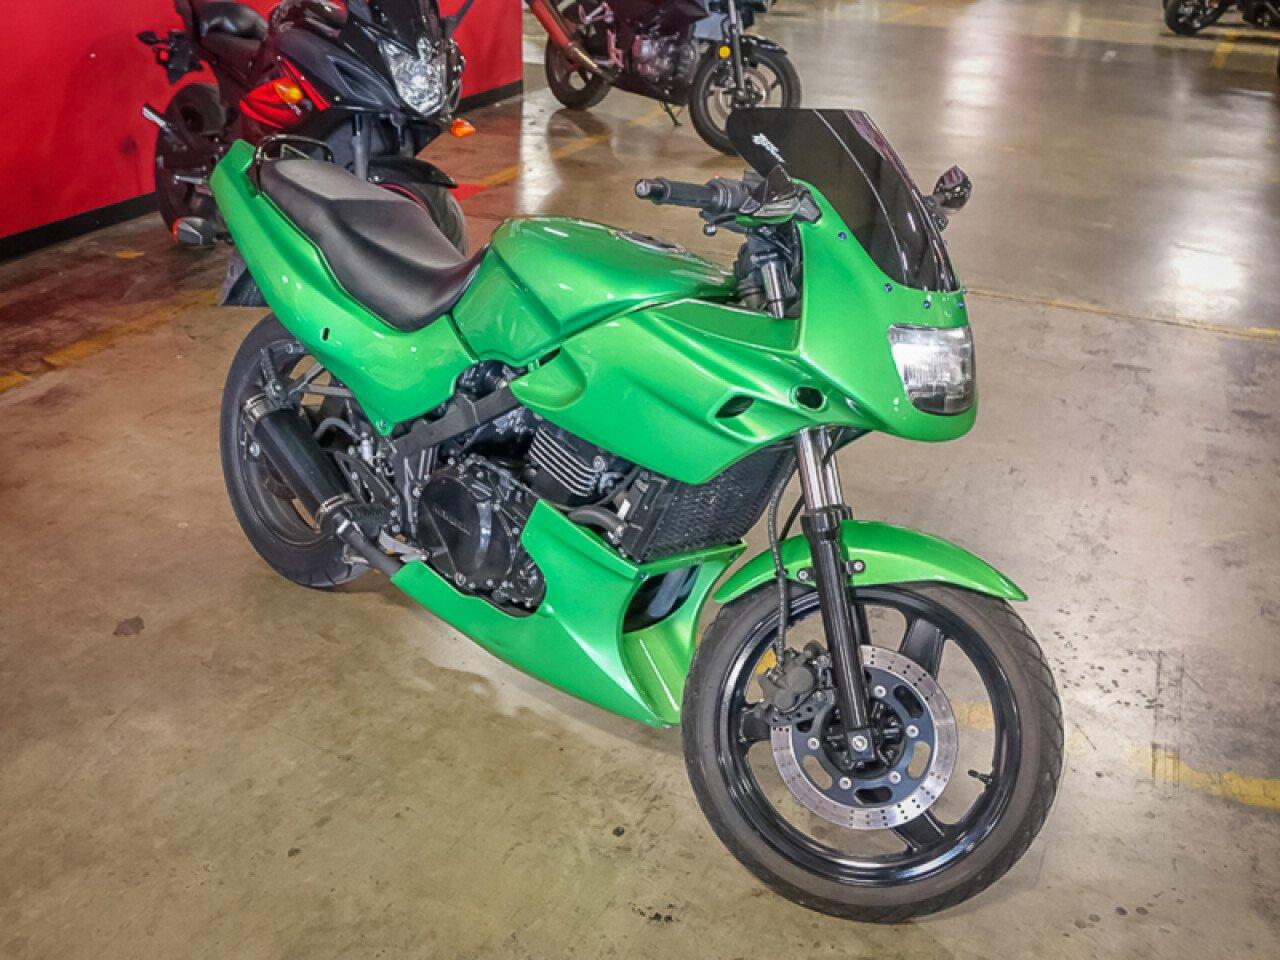 2009 kawasaki ninja 500r for sale near chattanooga, tennessee 37407